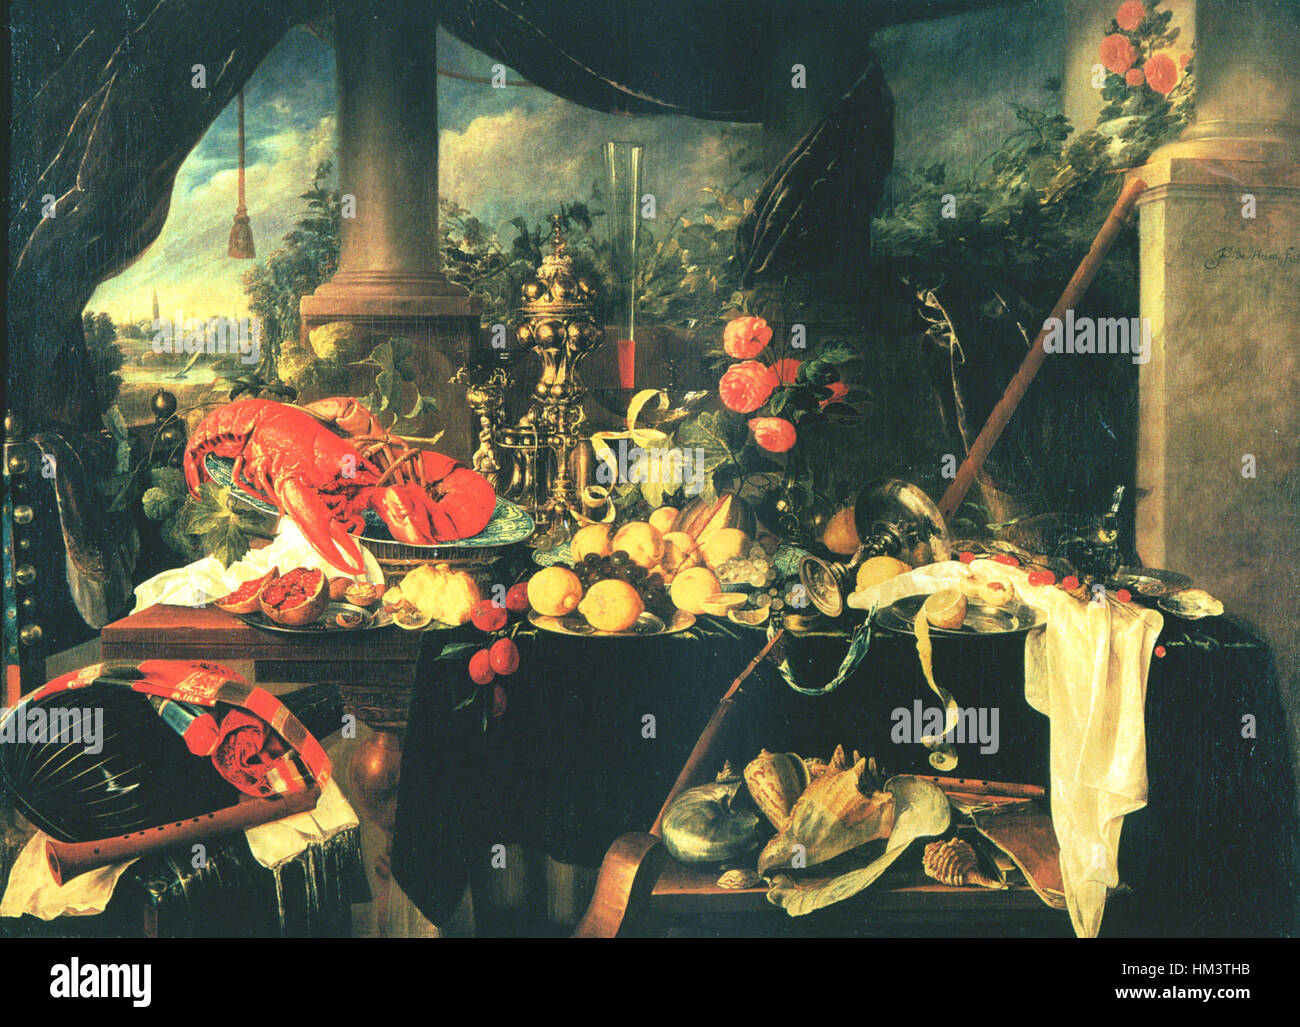 Jan-Davidsz-de-Heem-006 Banque D'Images